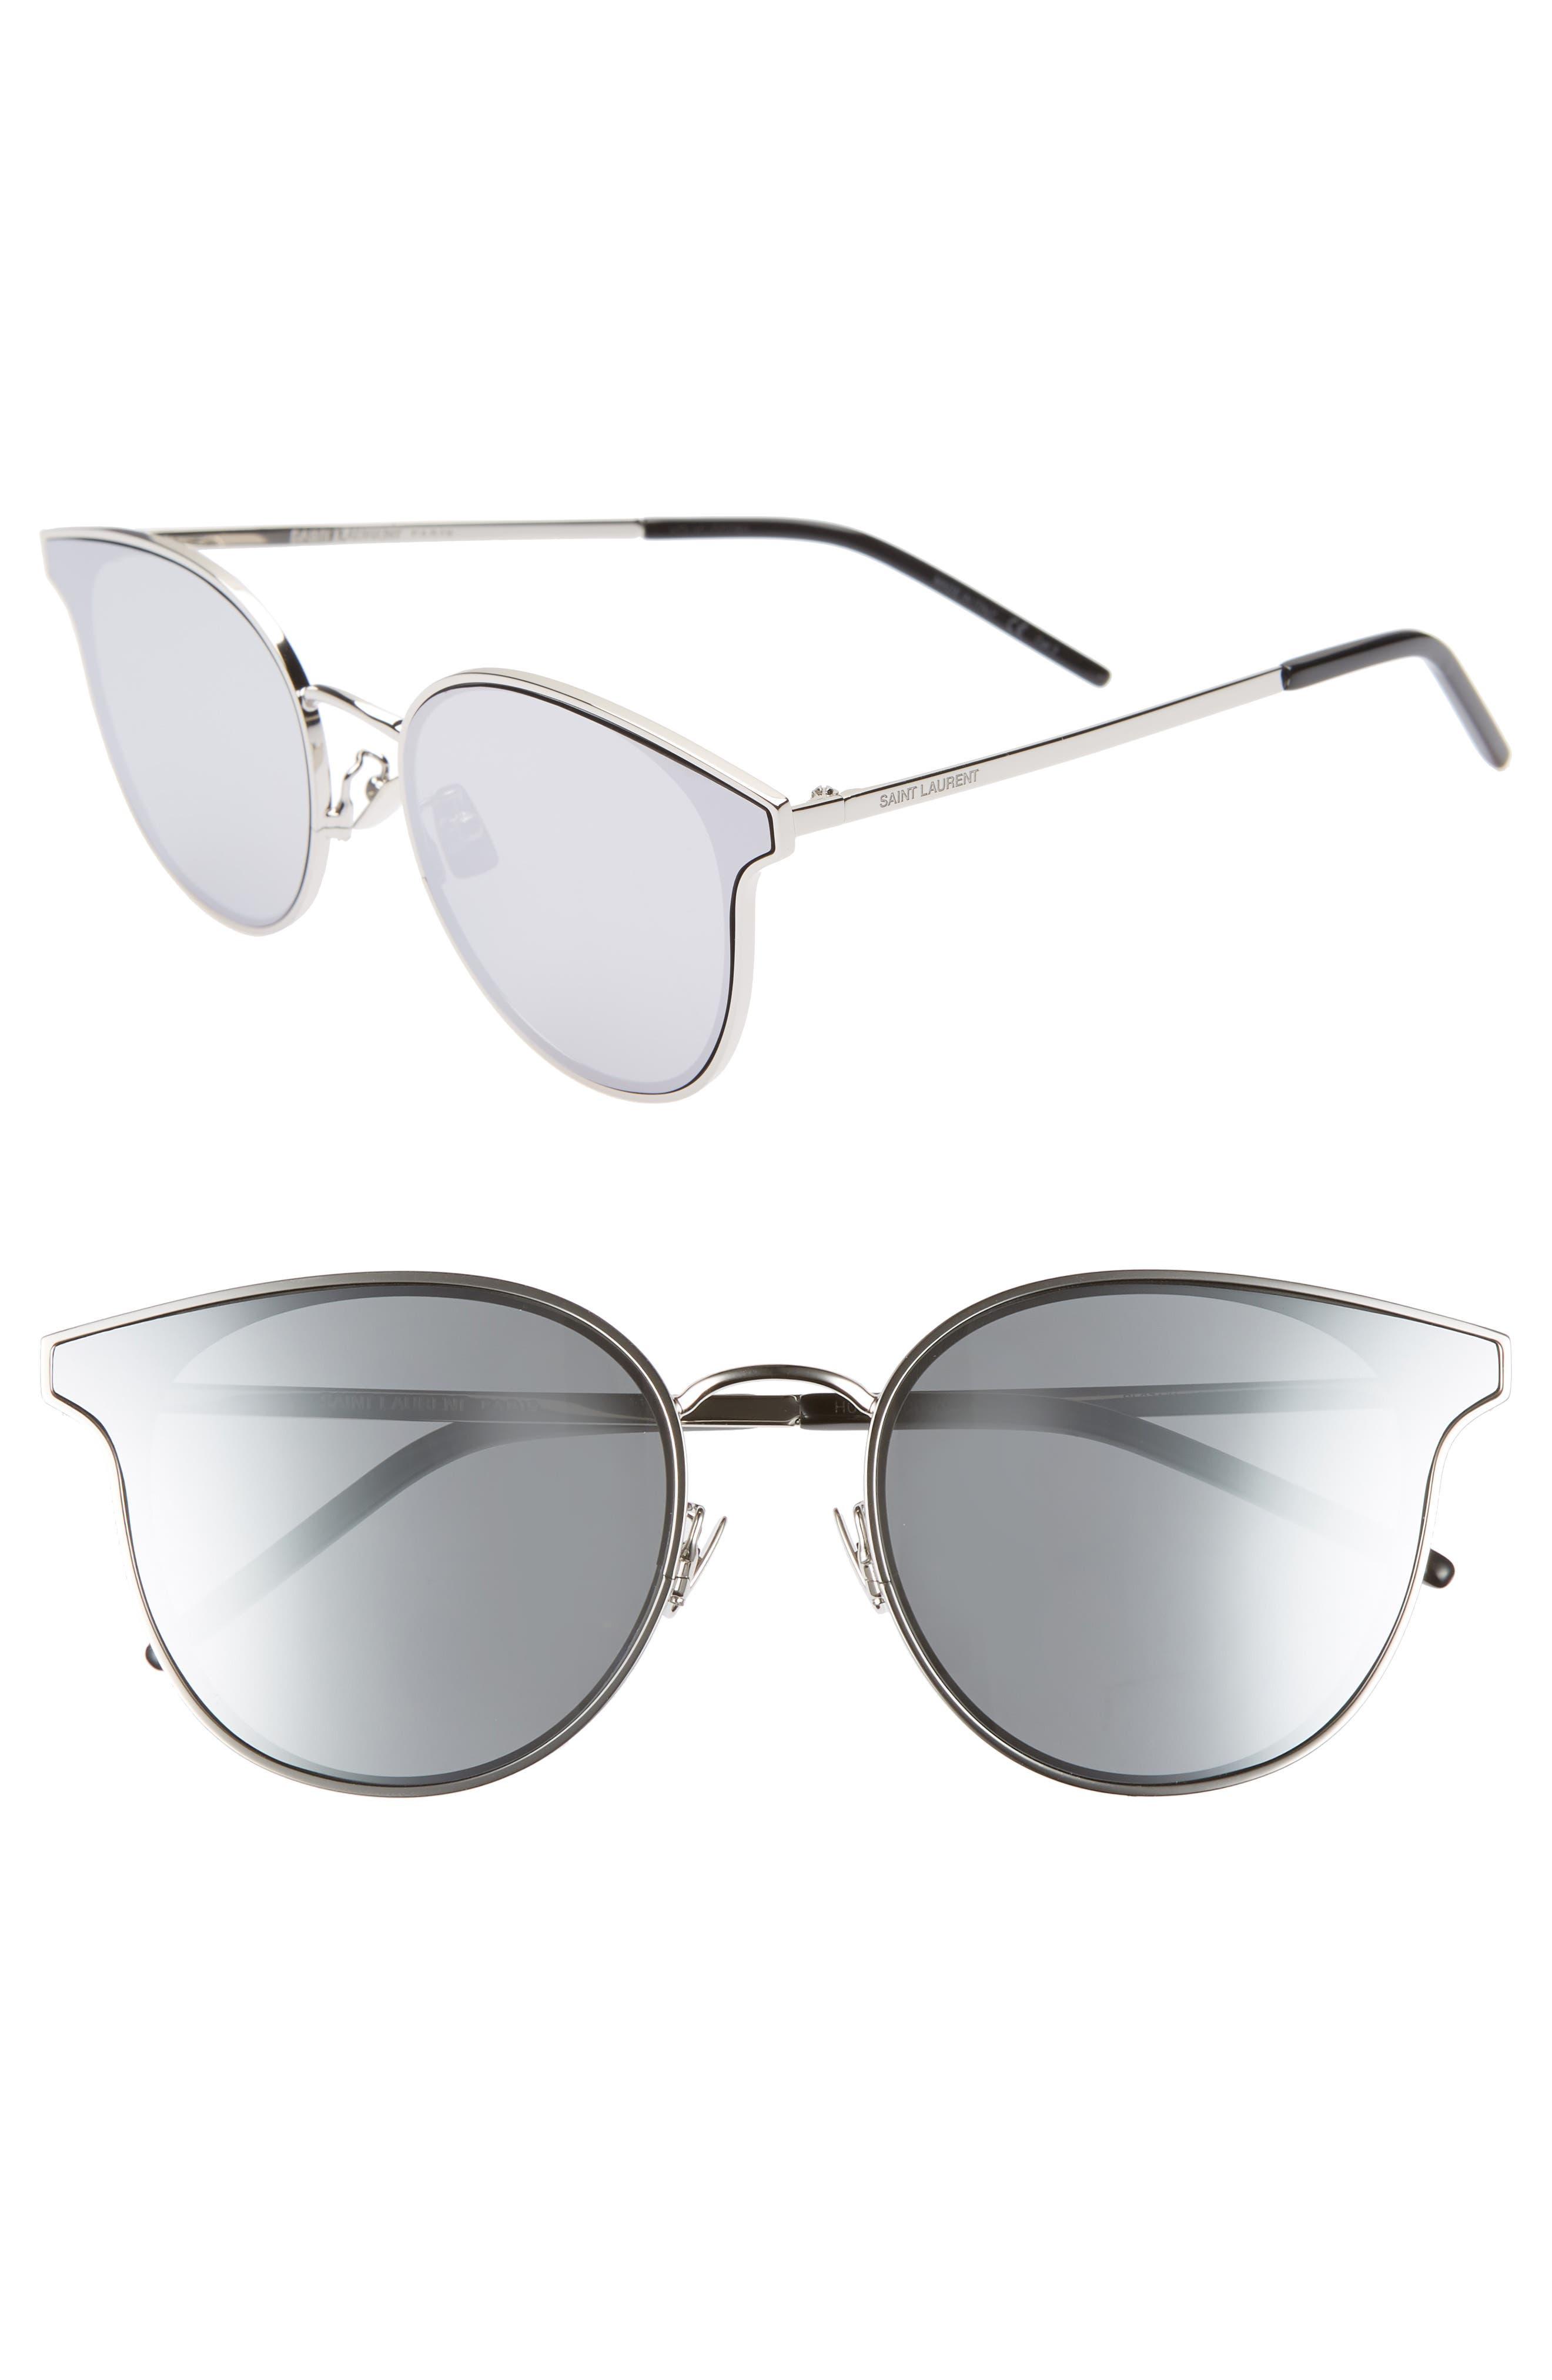 Saint Sunglasses Nordstrom Saint Sunglasses Saint Laurent Laurent Nordstrom Fqaw1fc